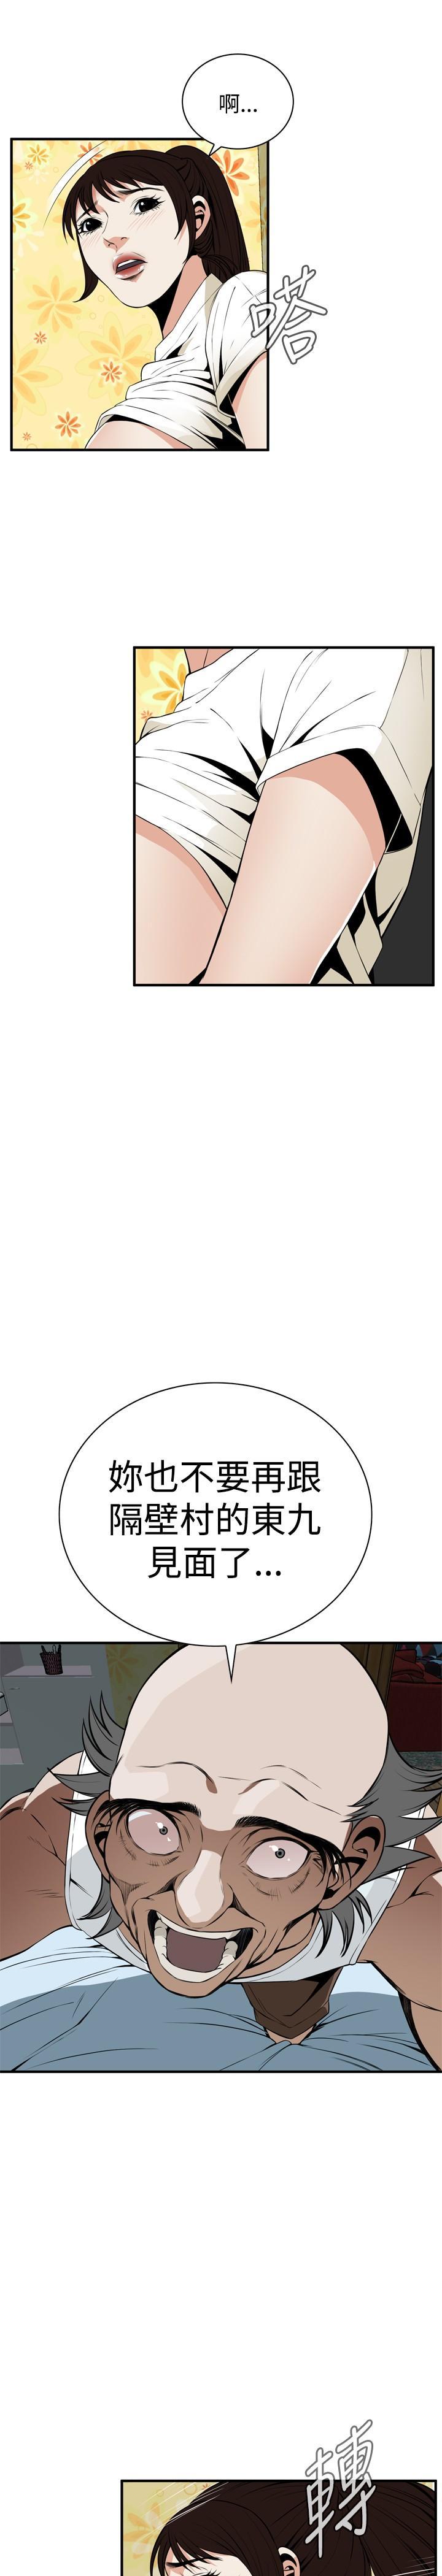 Take a Peek 偷窥 Ch.39~60 [Chinese]中文 8